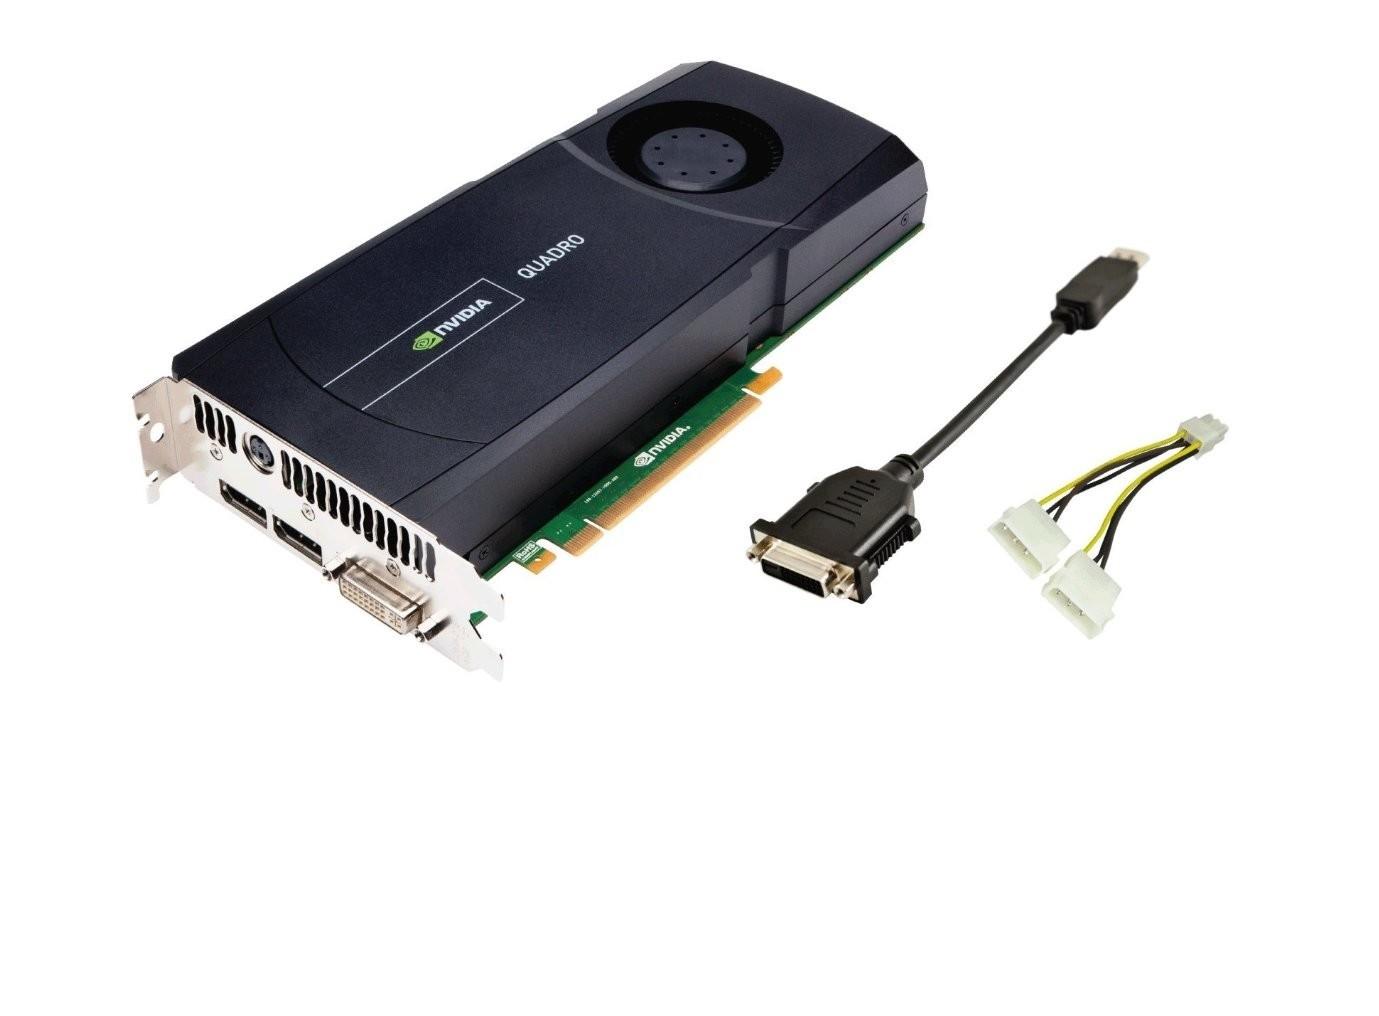 2.5GB HP 671138001 nVIDIA Quadro 5000 GDDR5 DVI-I 2 X DisplayPort TV-Out 2560x1600 PCI-E Graphics Card 671138-001